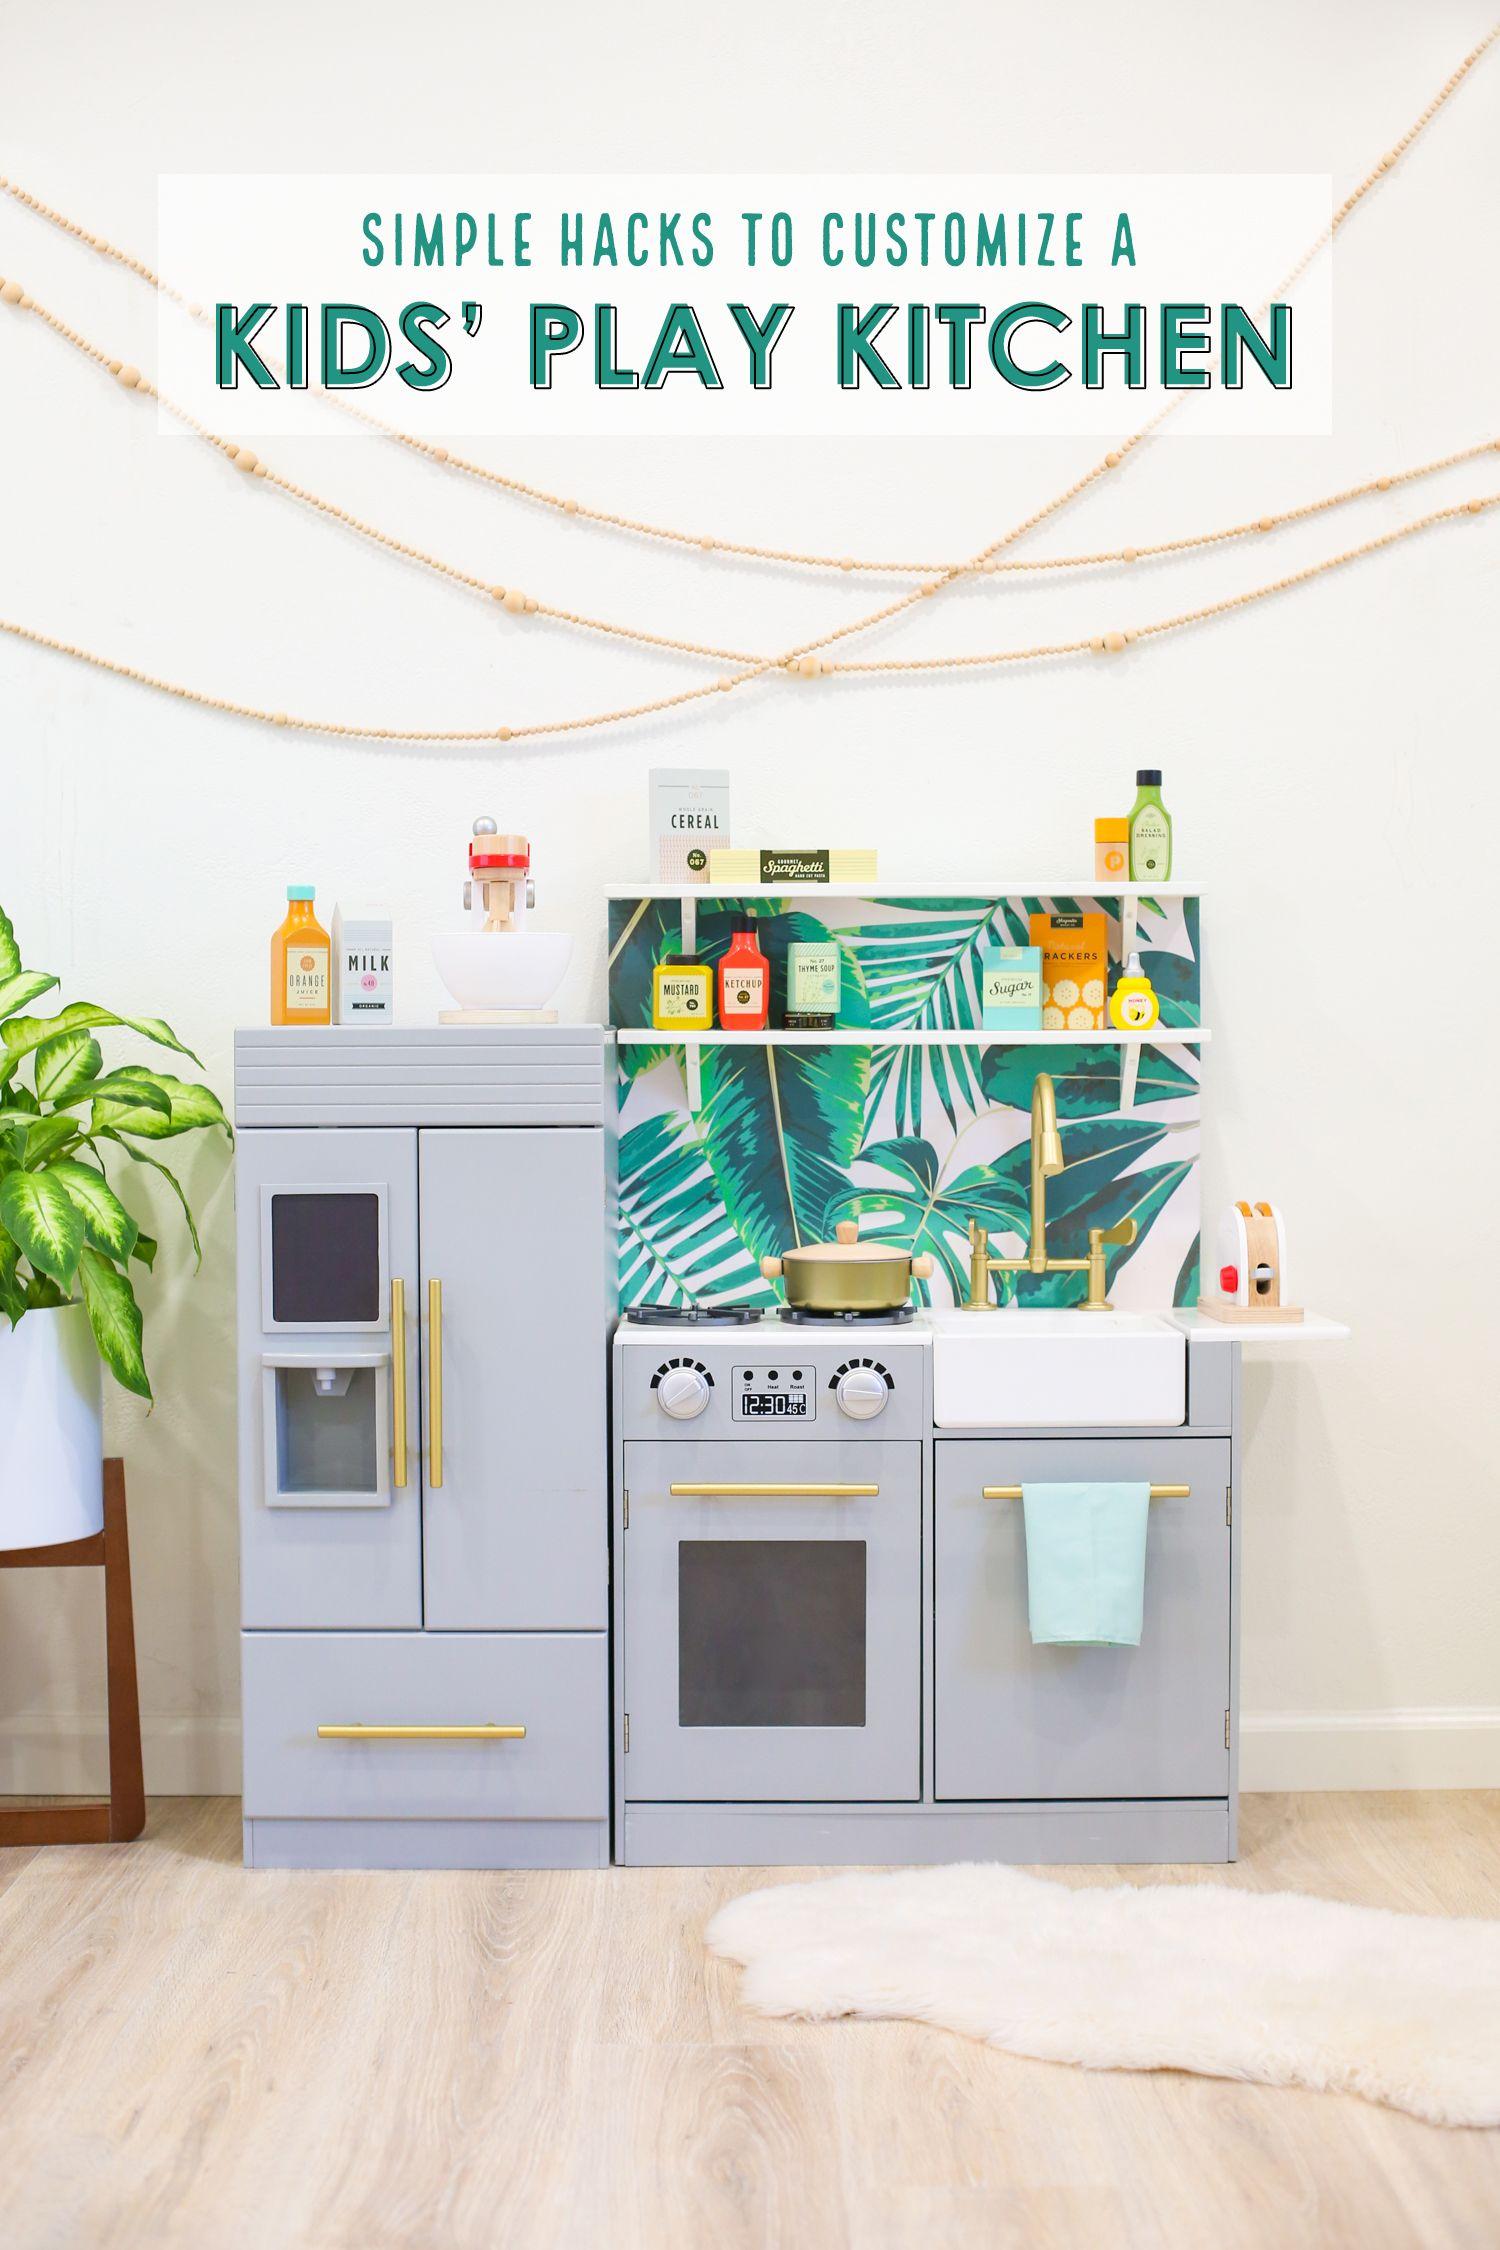 Diy kidsu play kitchen hacks and our favorite play kitchen